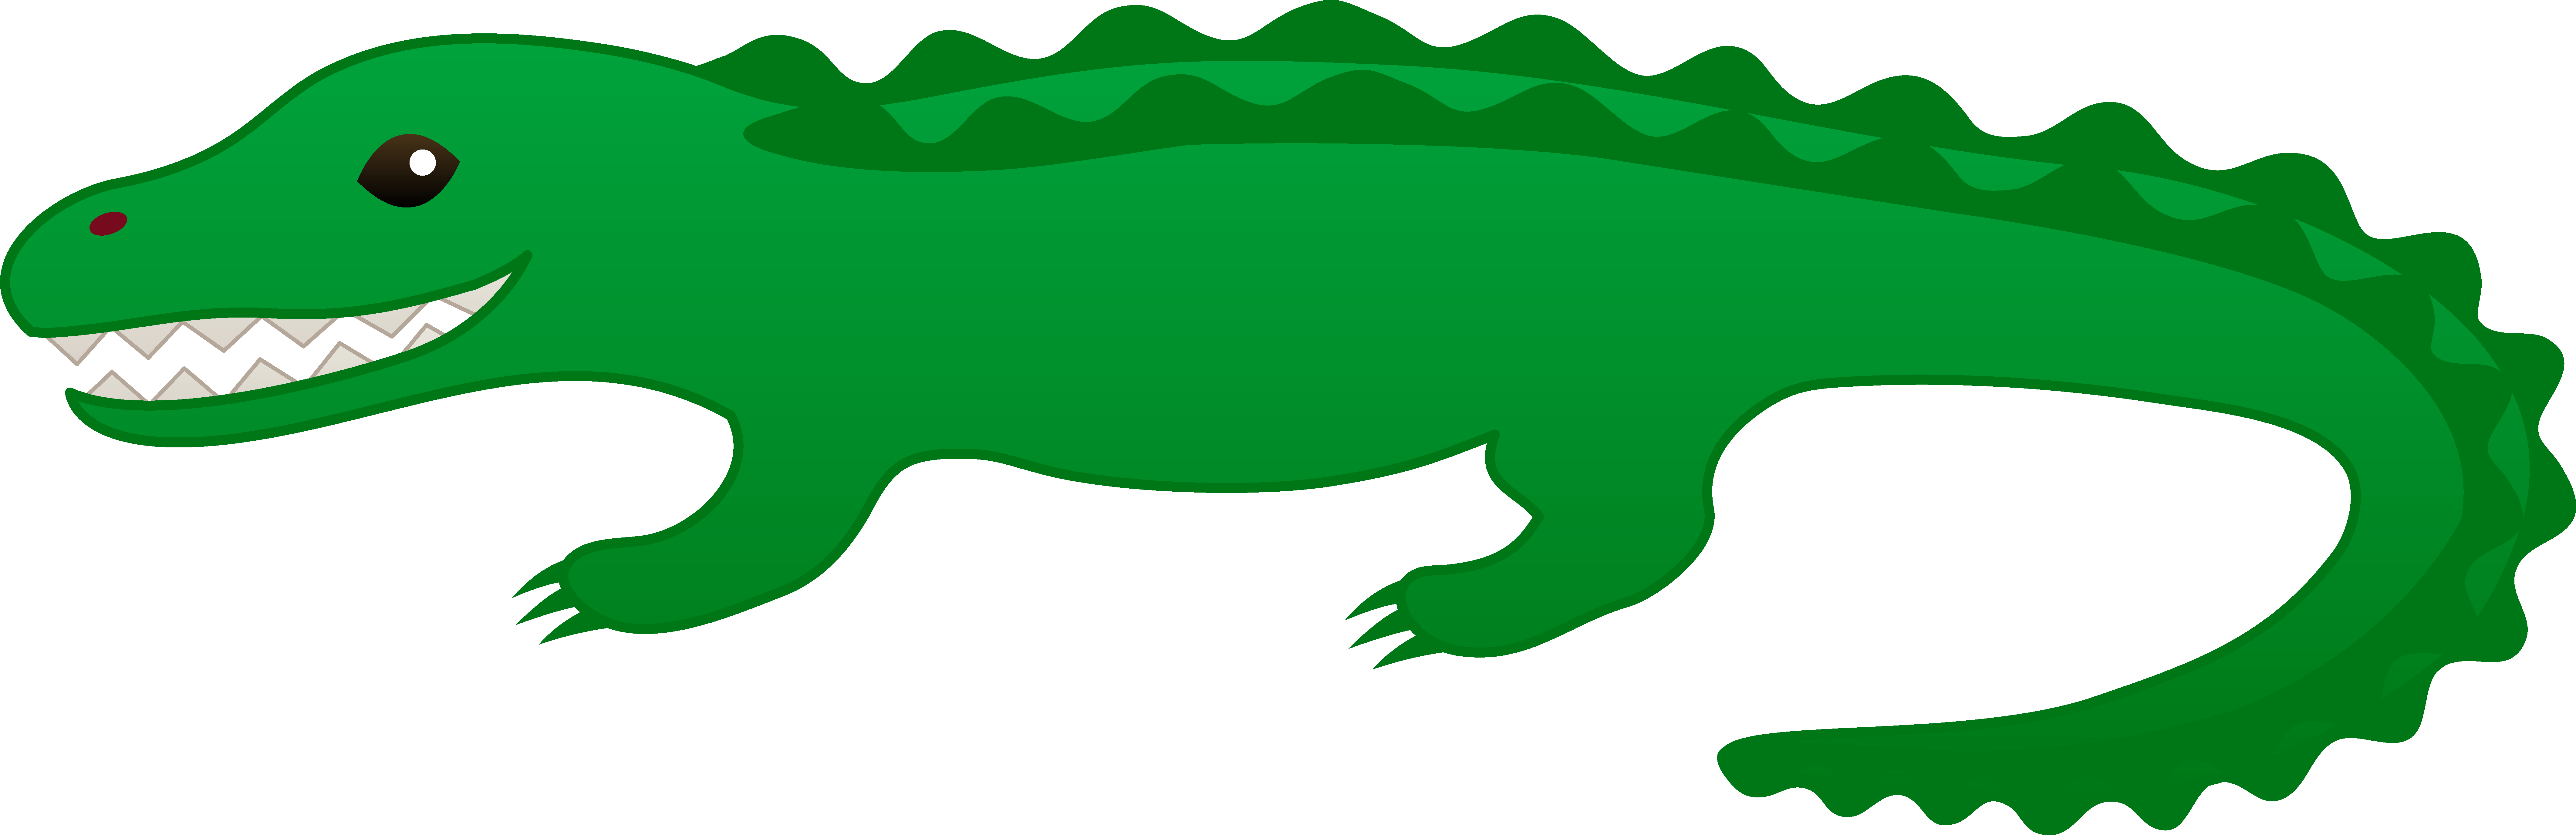 Reptile clipart alligator #6